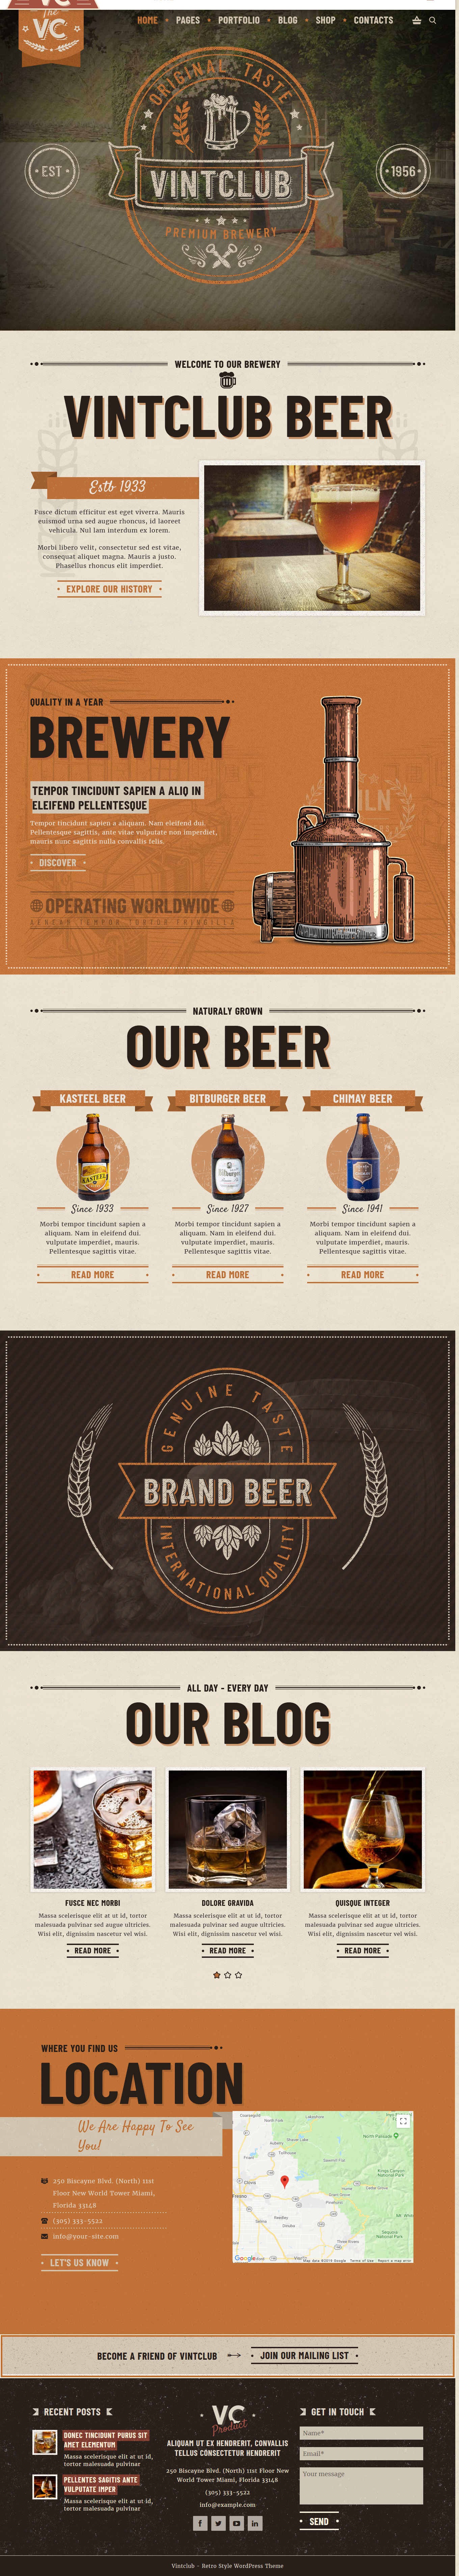 vintclub best premium bar pub wordpress theme - 10+ Best Premium Bar and Pub WordPress Themes